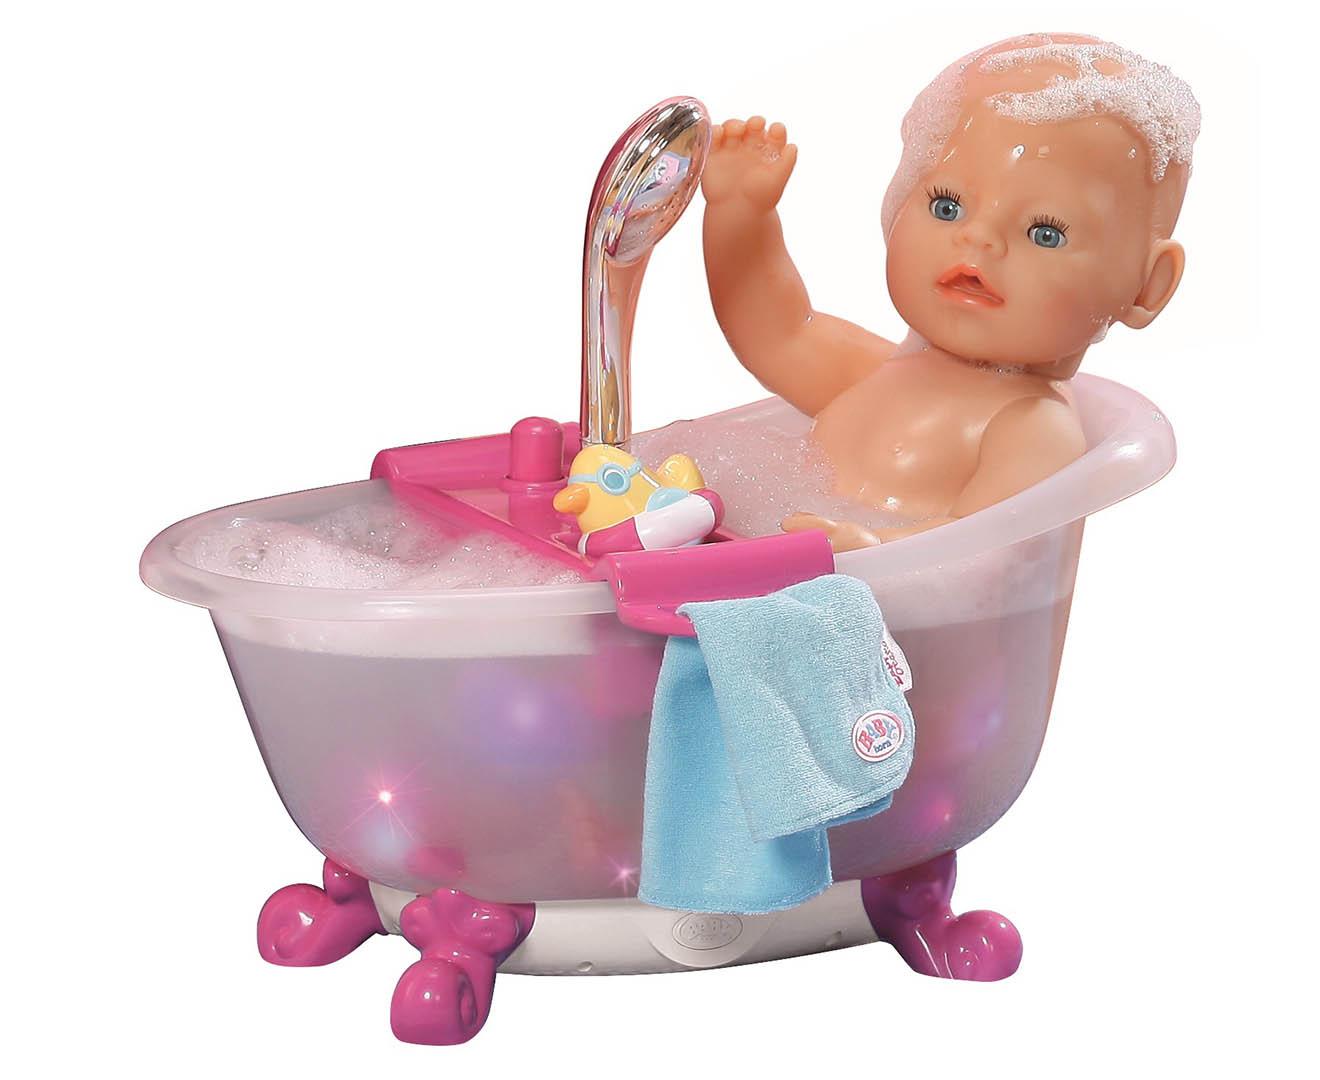 babyborn interactive bathtub w duck. Black Bedroom Furniture Sets. Home Design Ideas